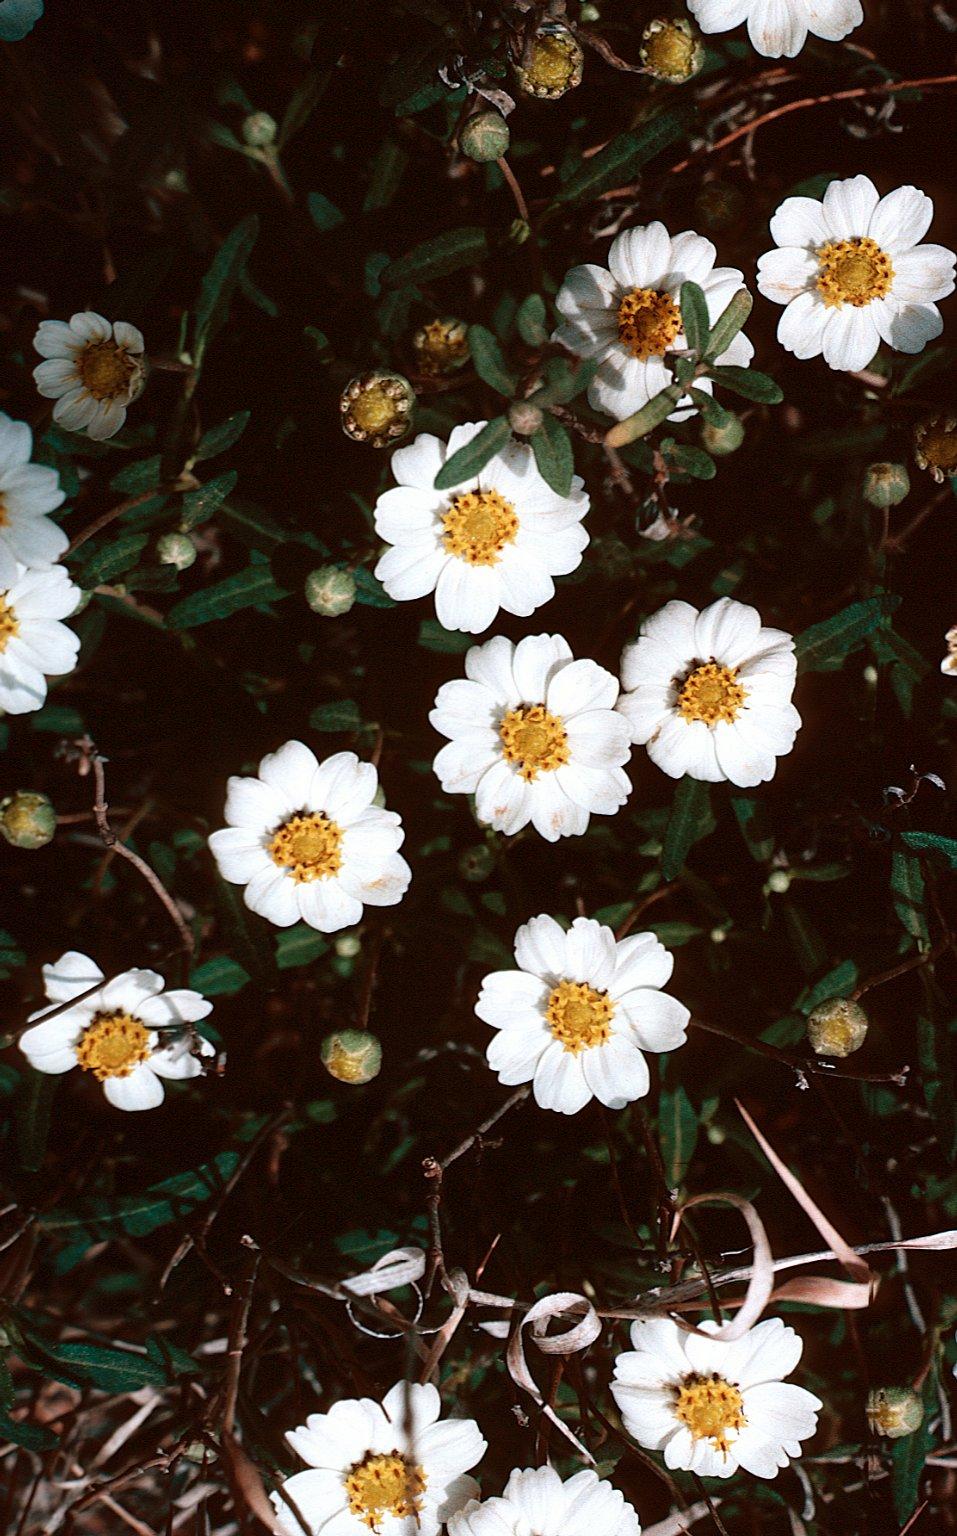 Melampodium leucanthum Torr. & A. Gray